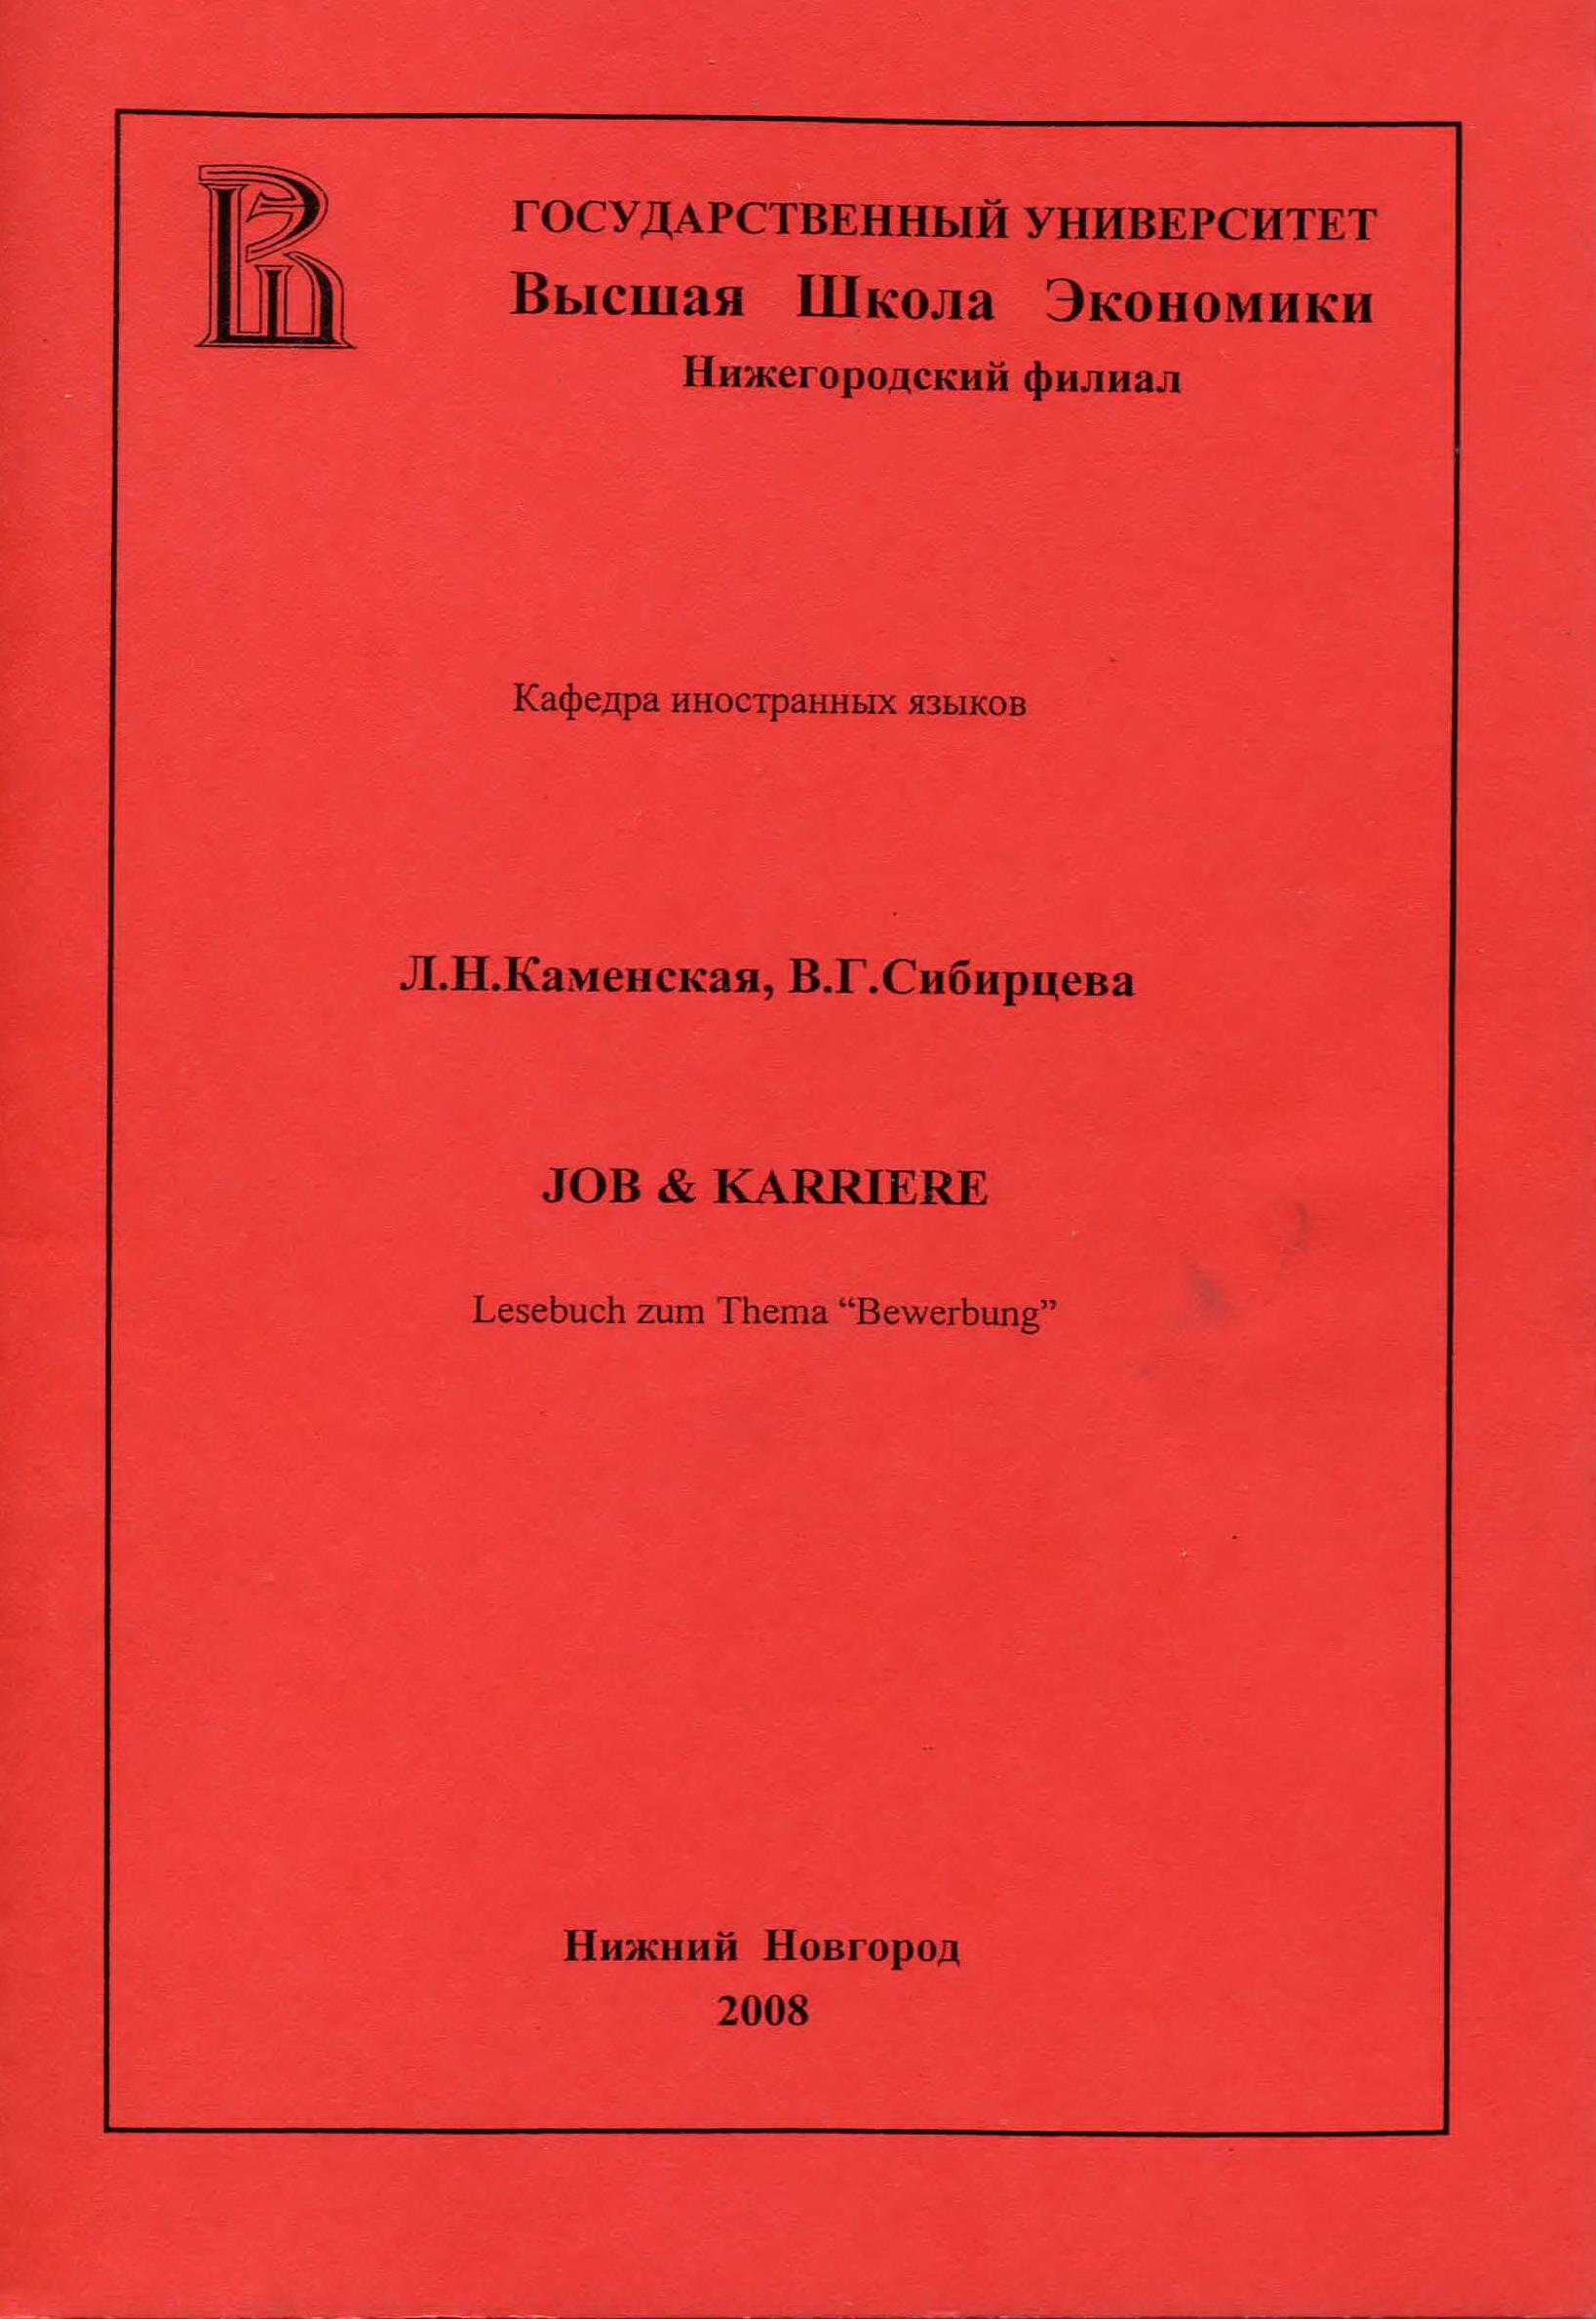 "Job & Karriere. Lesebuch zum Thema ""Bewerbung"""